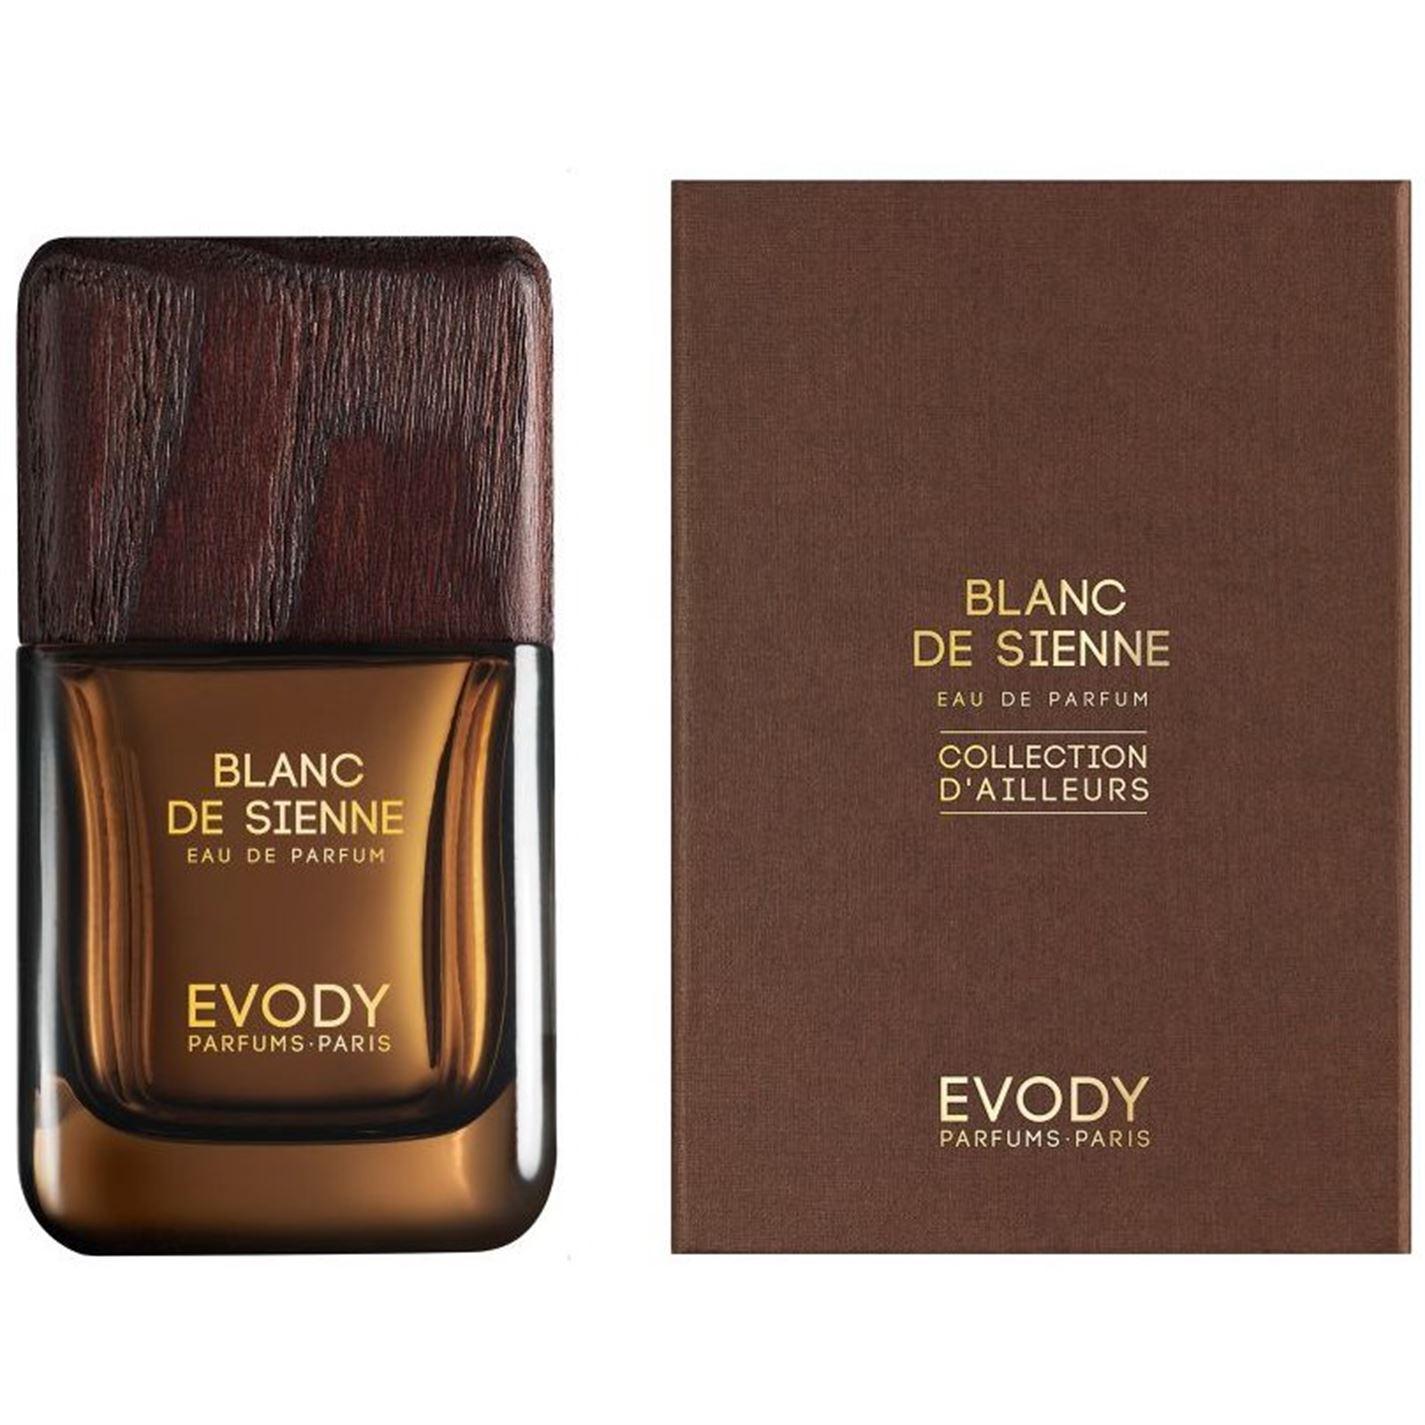 Evody Blanc de Sienne Eau de Parfum 50ml